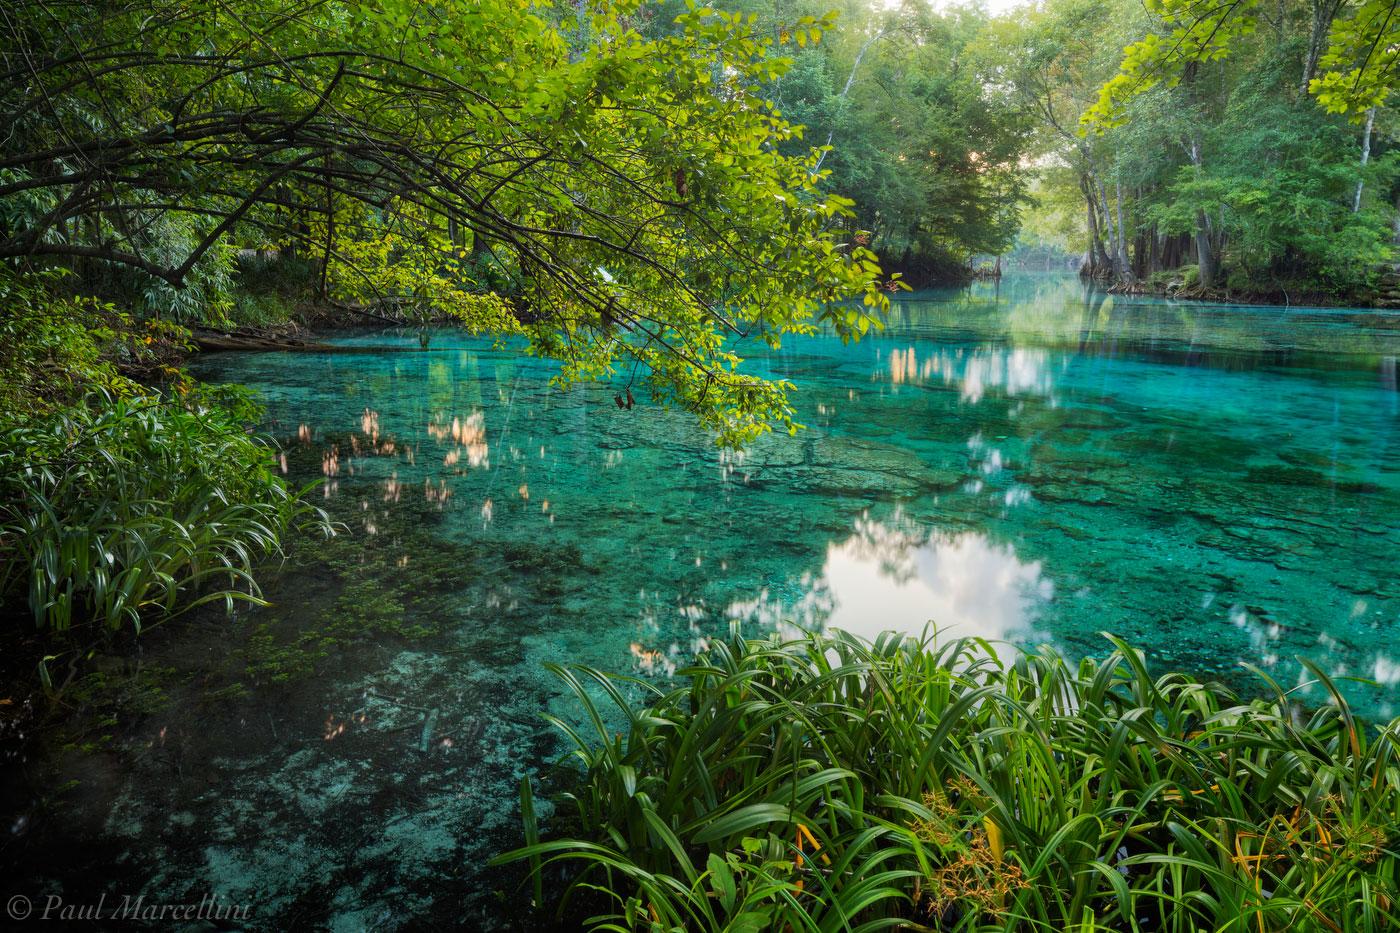 ginnie springs, sunrise, santa fe river, florida, nature, photography, photo